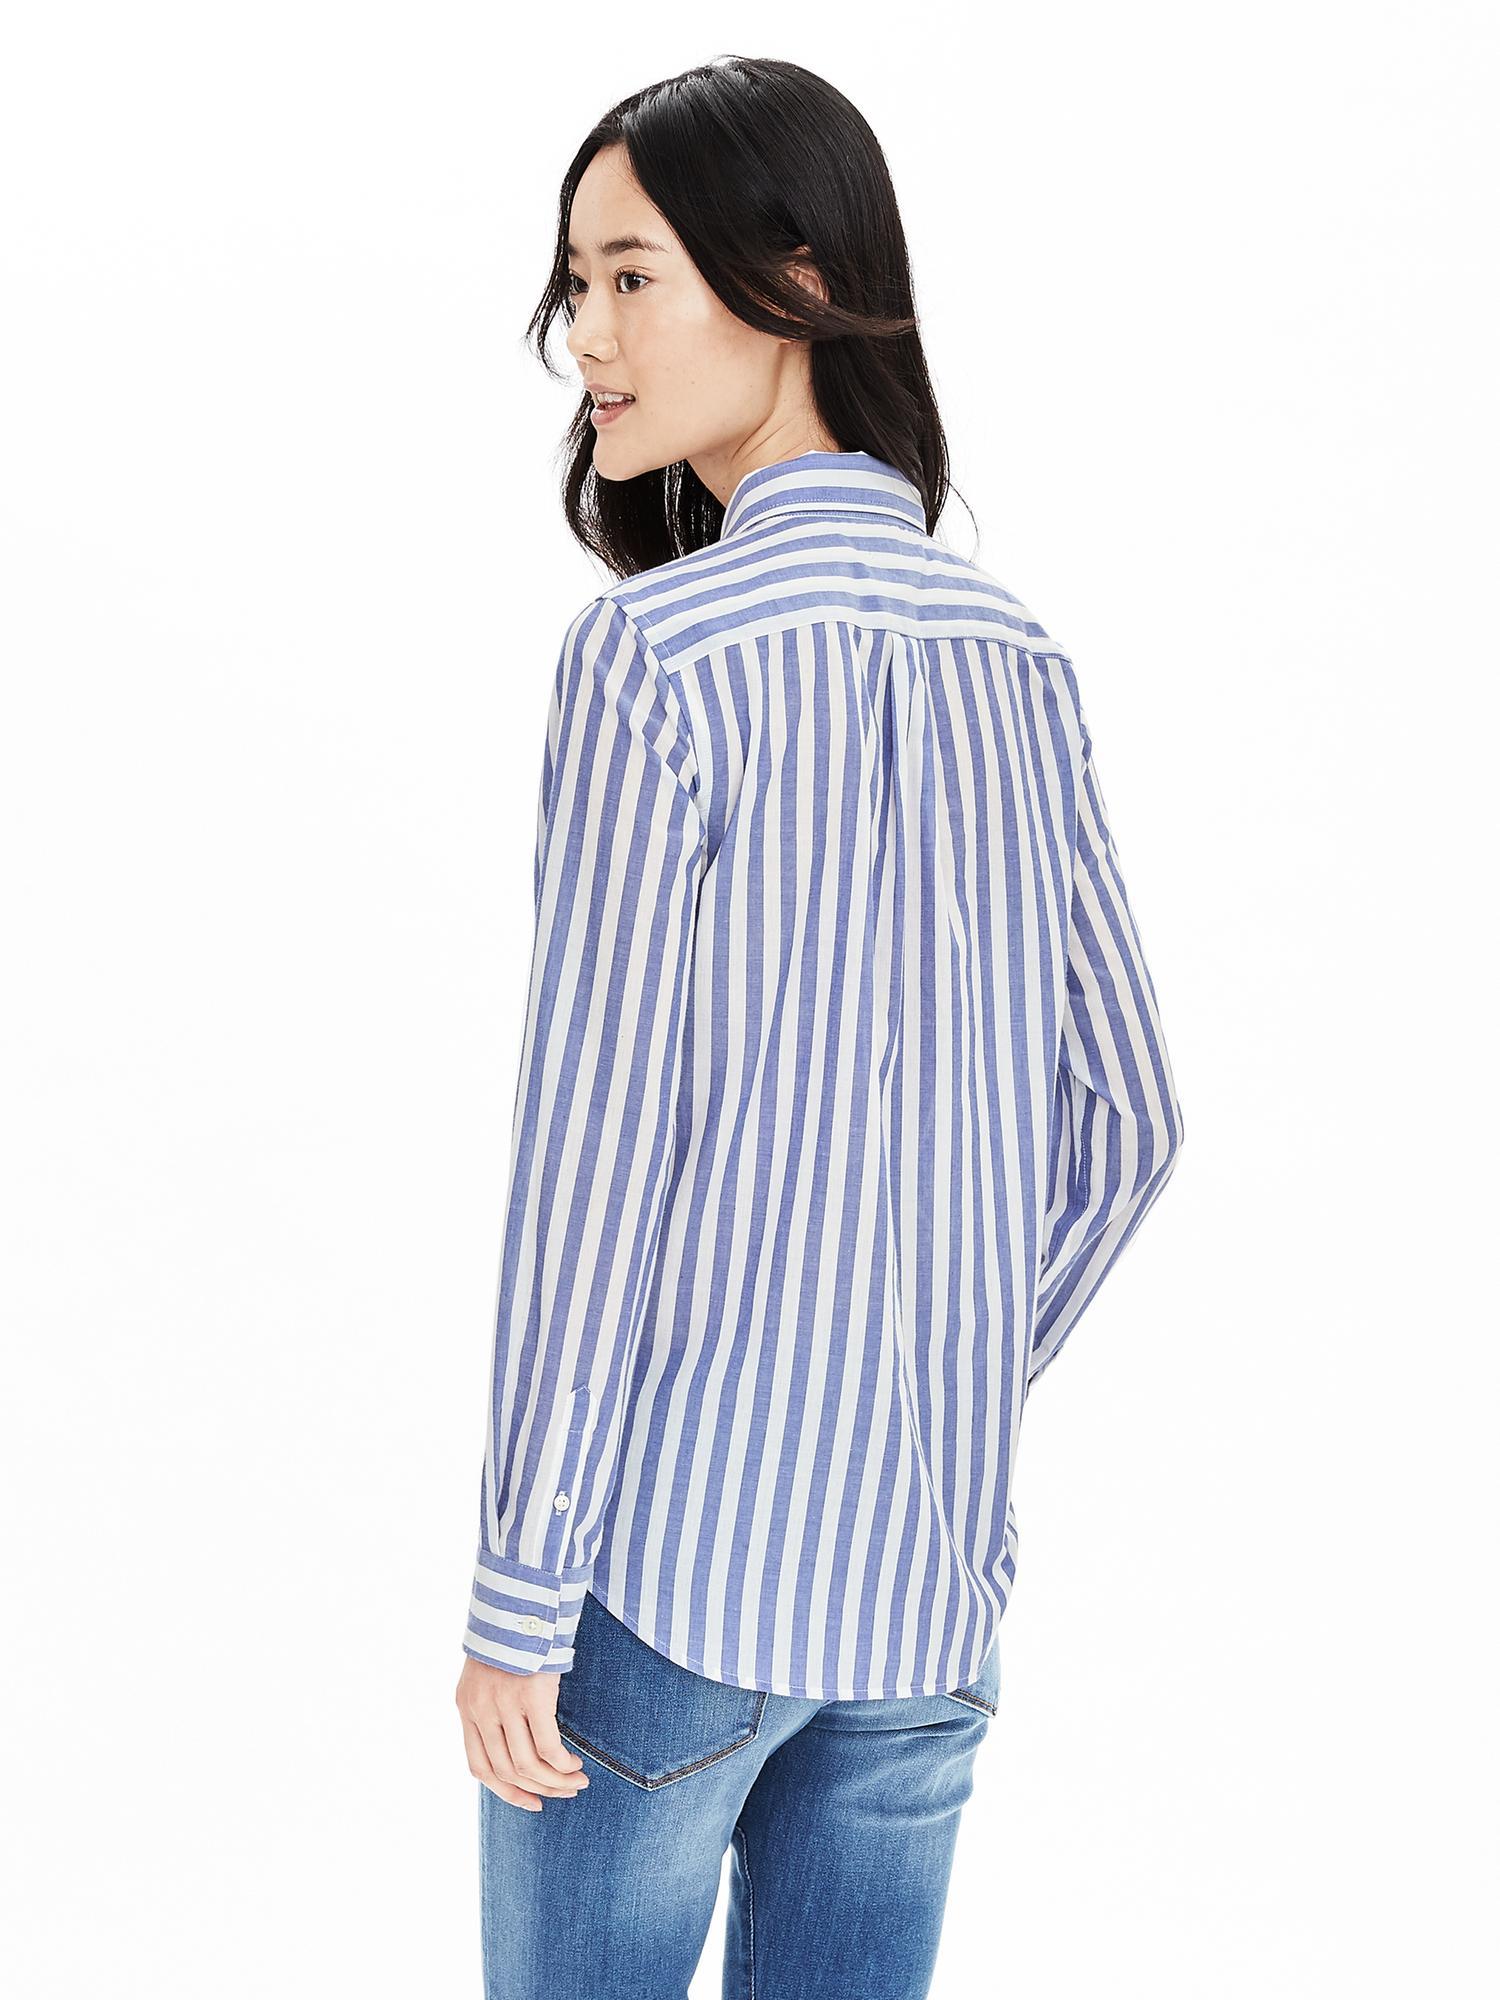 57bf20033984a Lyst - Banana Republic Dillon-fit Vertical Stripe Shirt